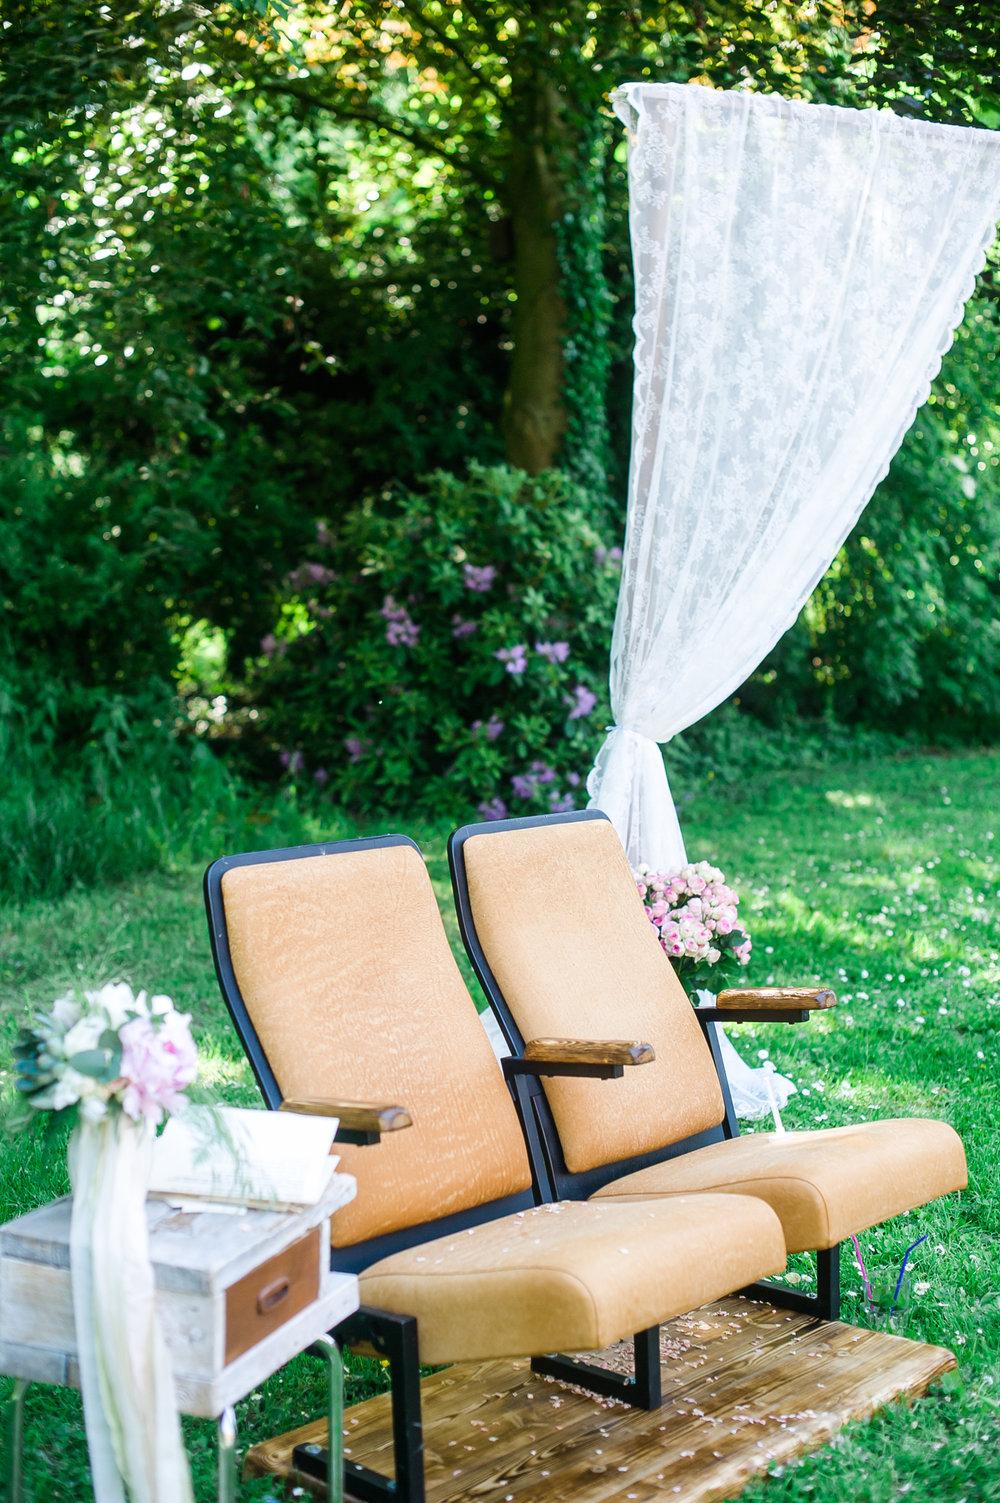 AdobeBridgeBatchRenameTemp47Britta Schunck Photography_bohowedding_gardenwedding.jpg